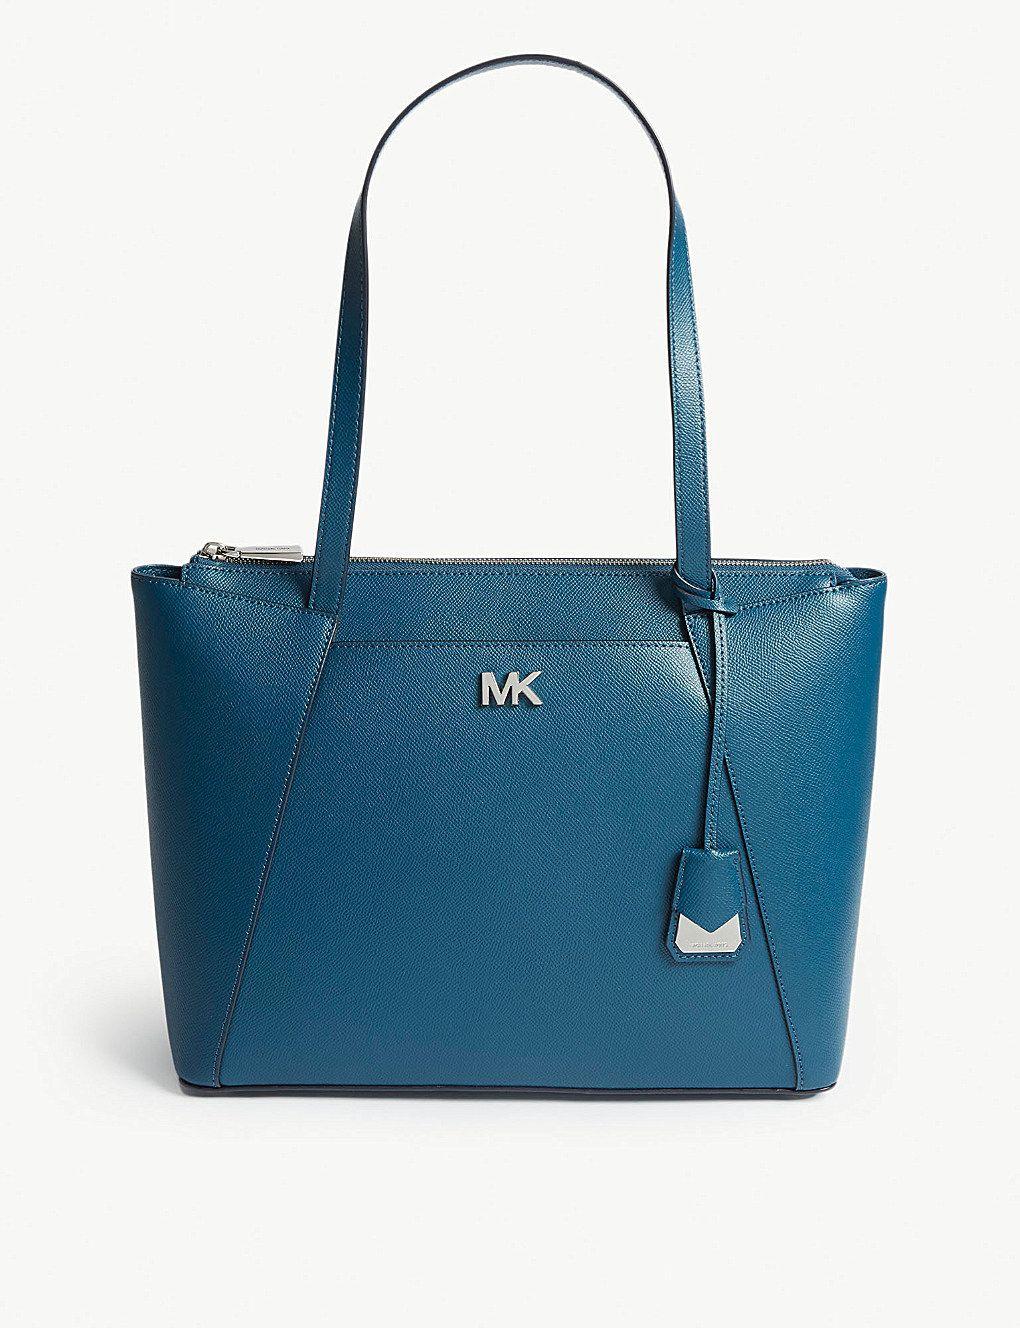 f6a4d37506ea Dubai Leather Sticker   Wishlist - Bags   Leather handbags, Bags, Leather